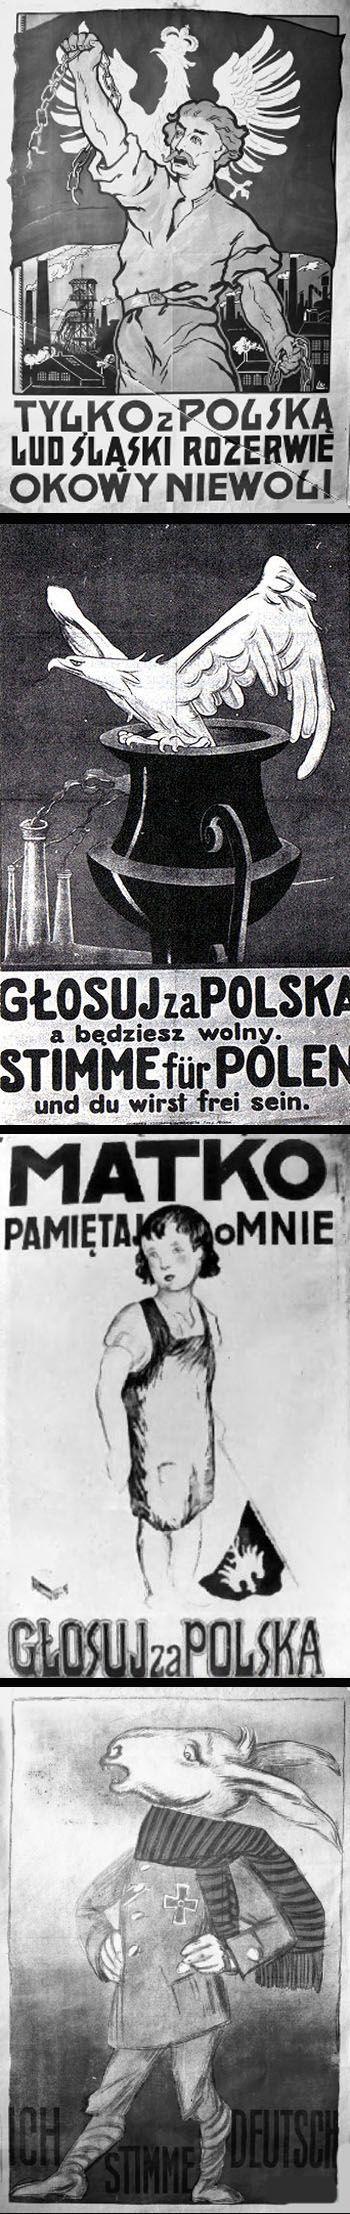 plebistyt_na_slasku_plakat_design_po_polsku